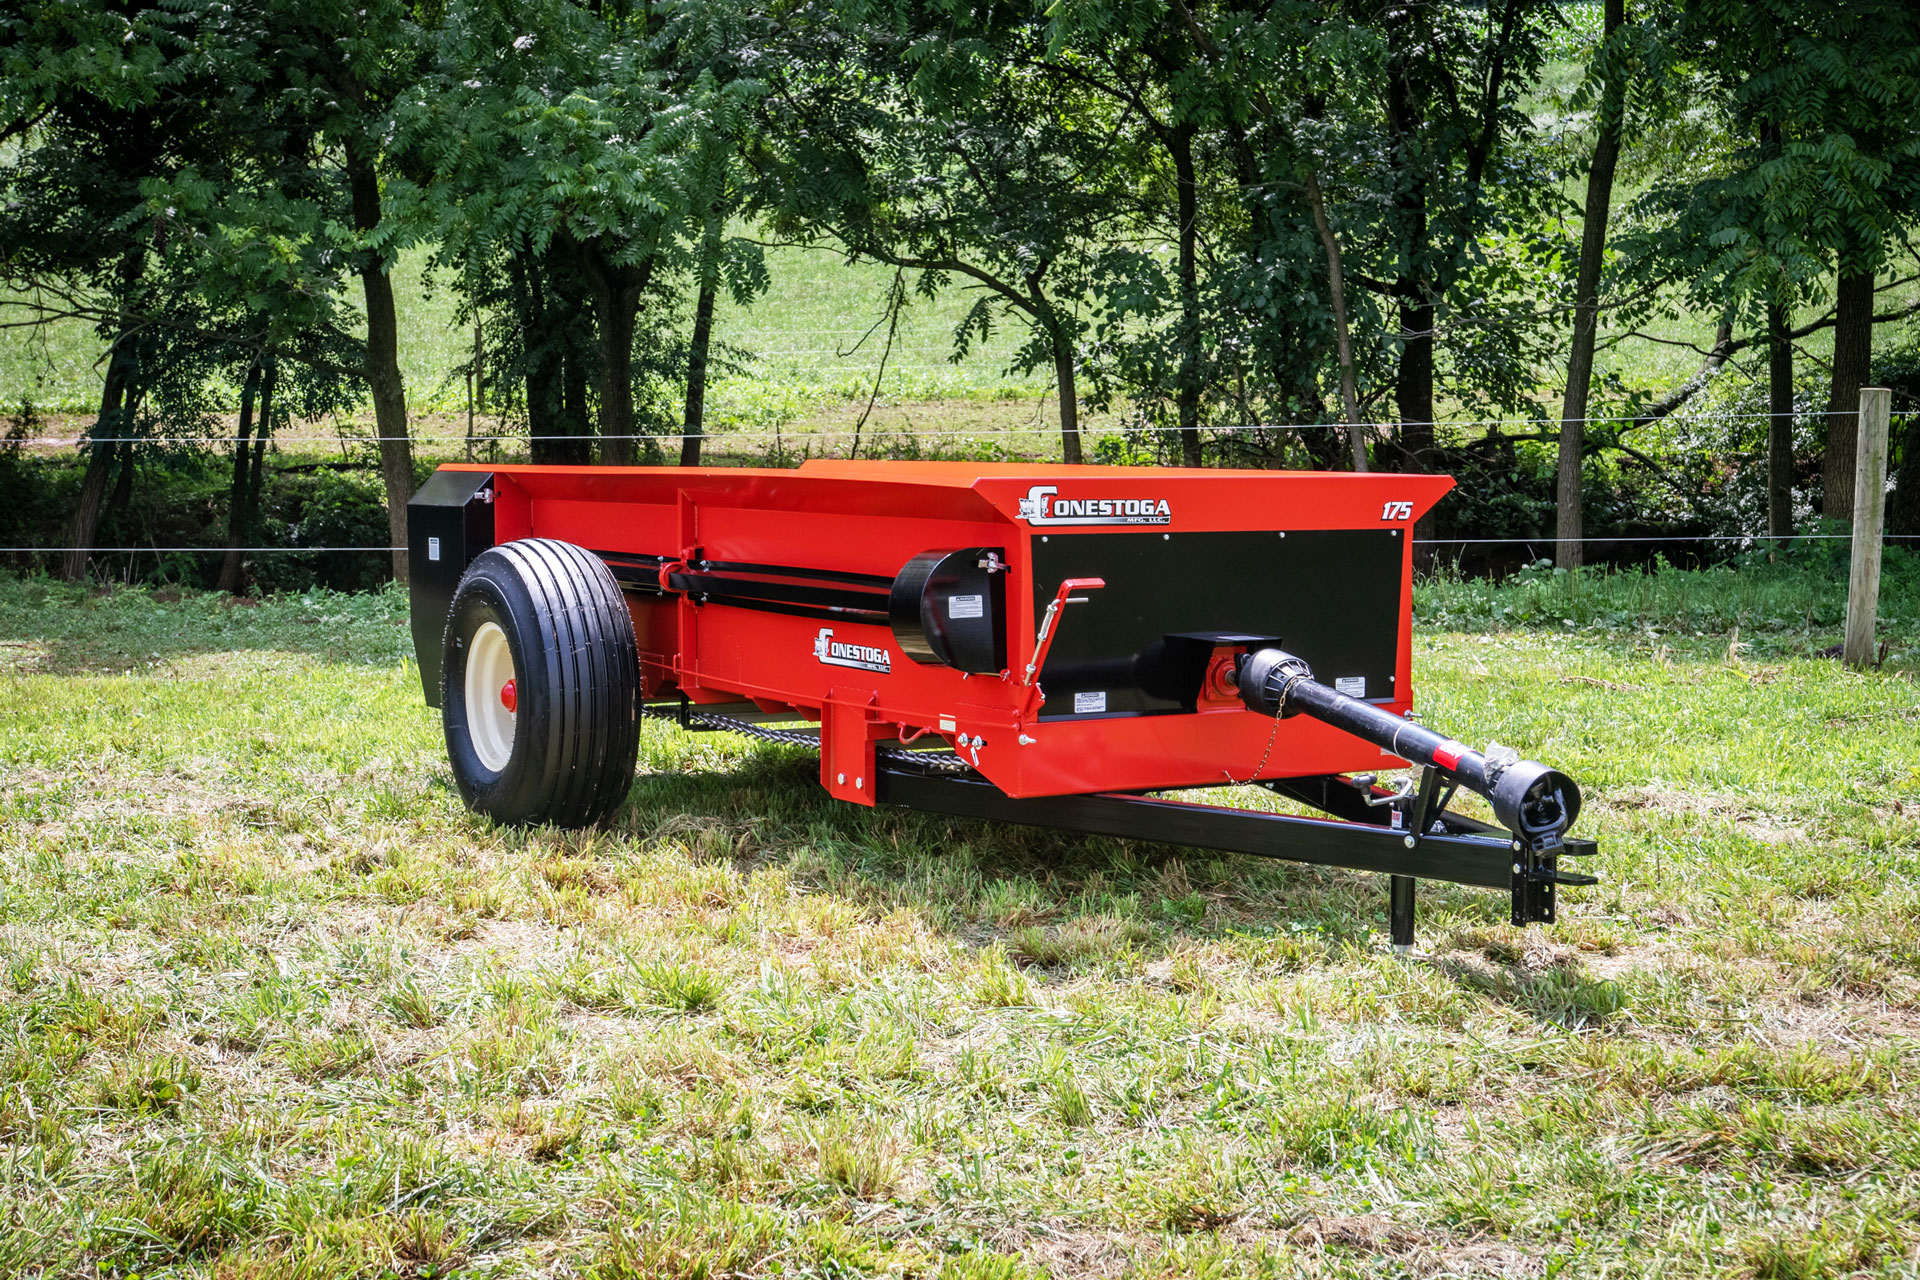 PTO large farm manure spreader by conestoga manure spreaders.